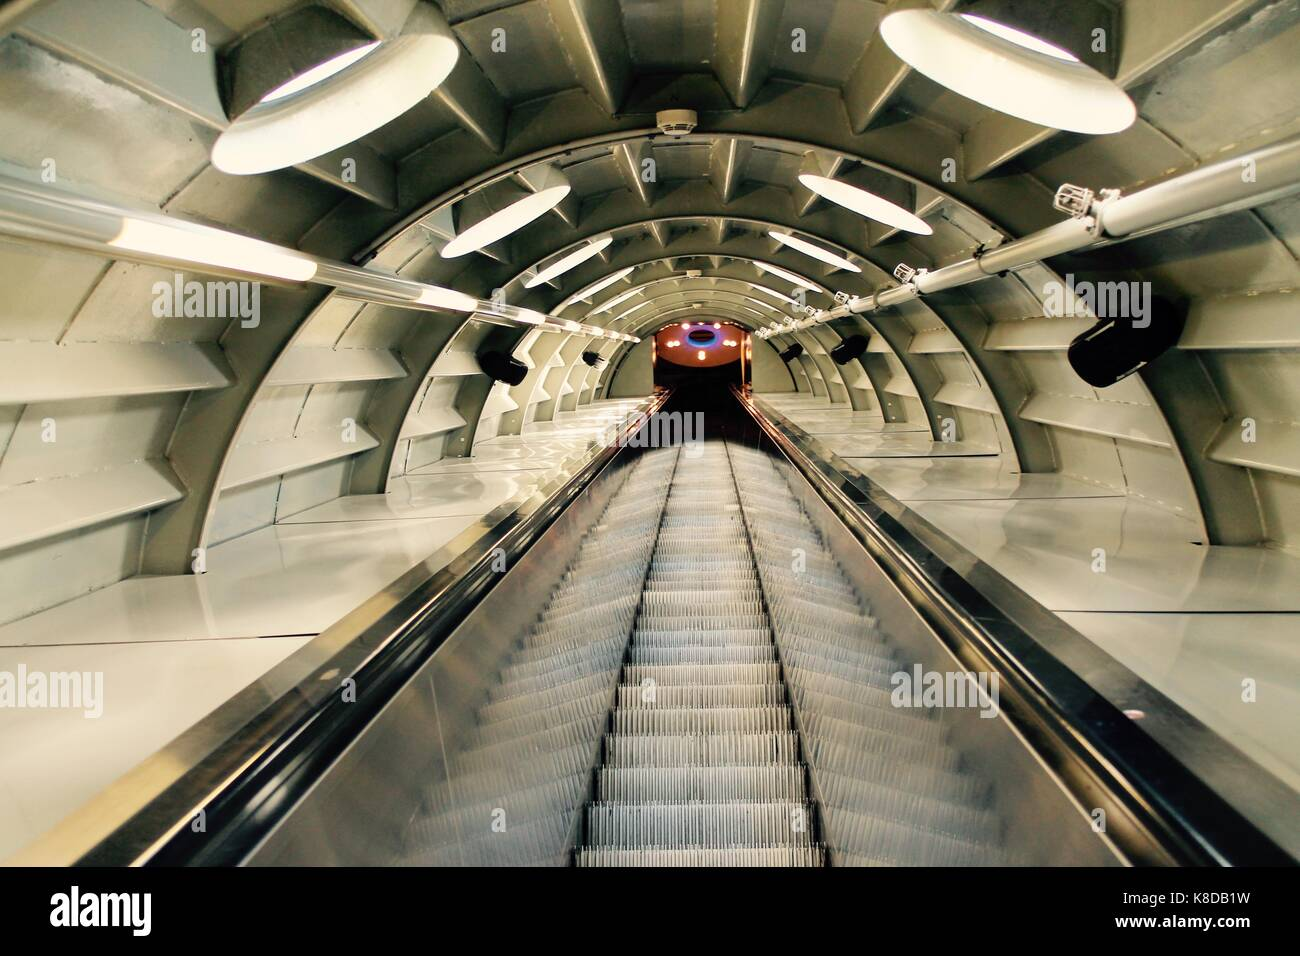 Futuristic Stairs Looks Like A Spaceship Stock Photo 160104613 Alamy